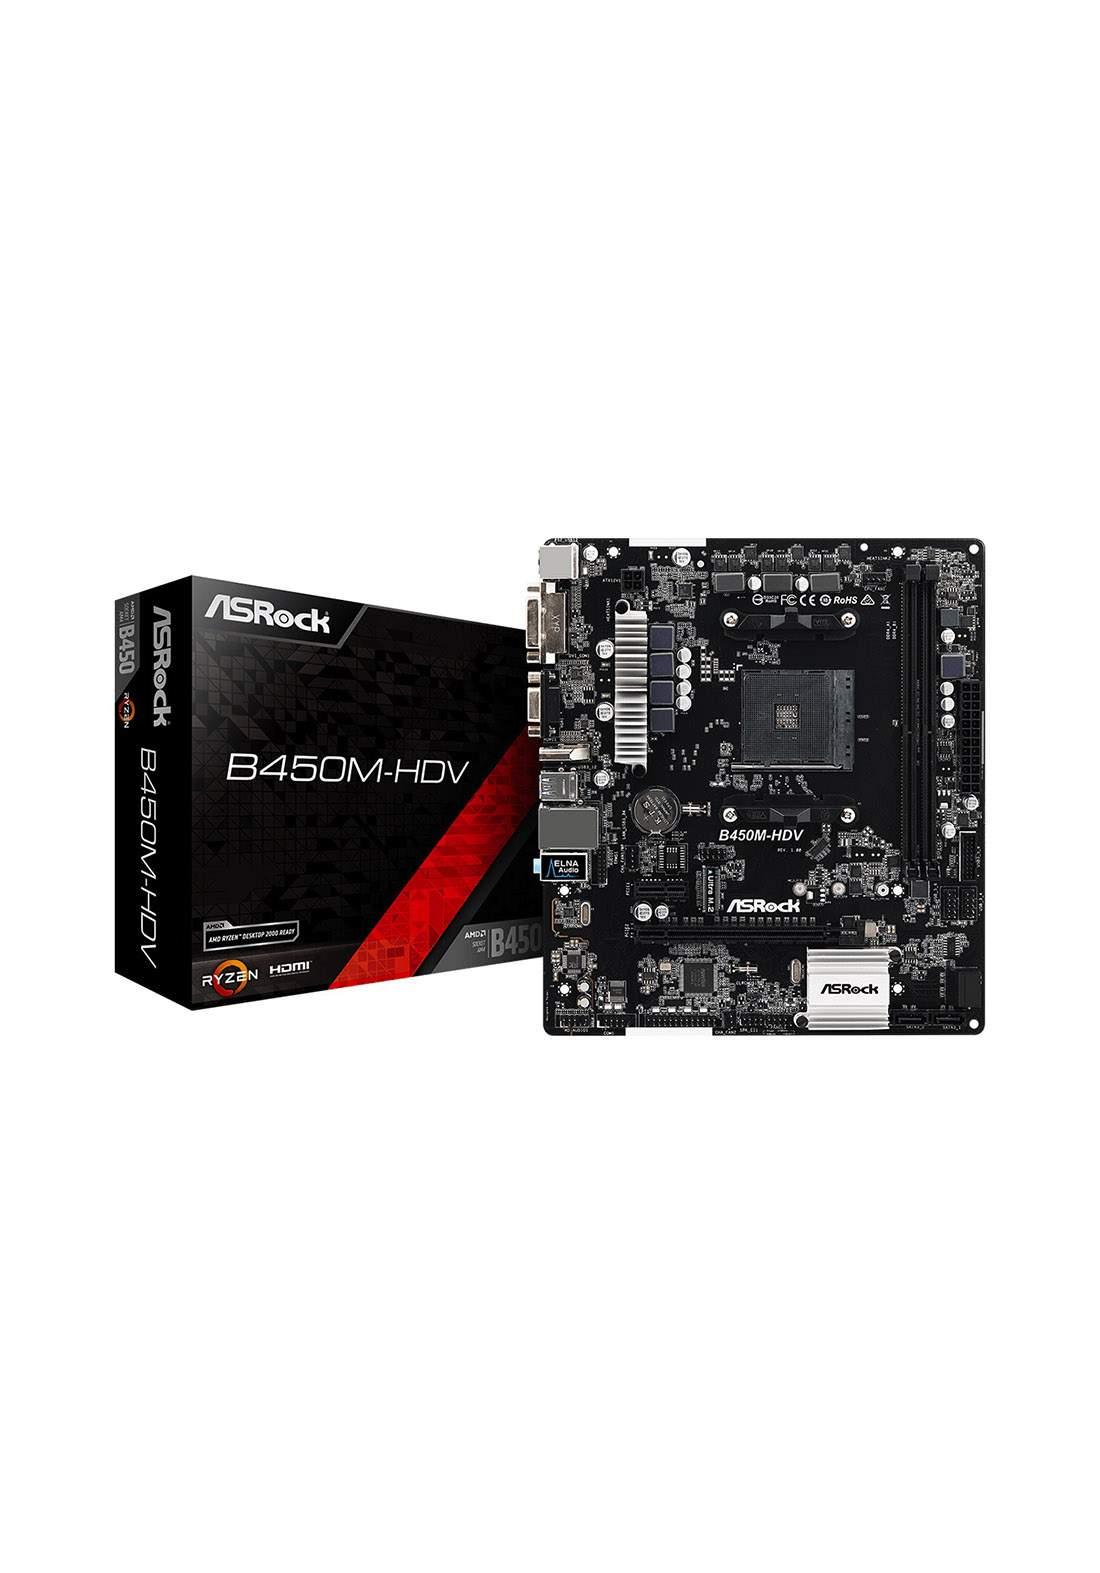 ASRock B450M-HDV Desktop Motherboard - Black لوحة الام